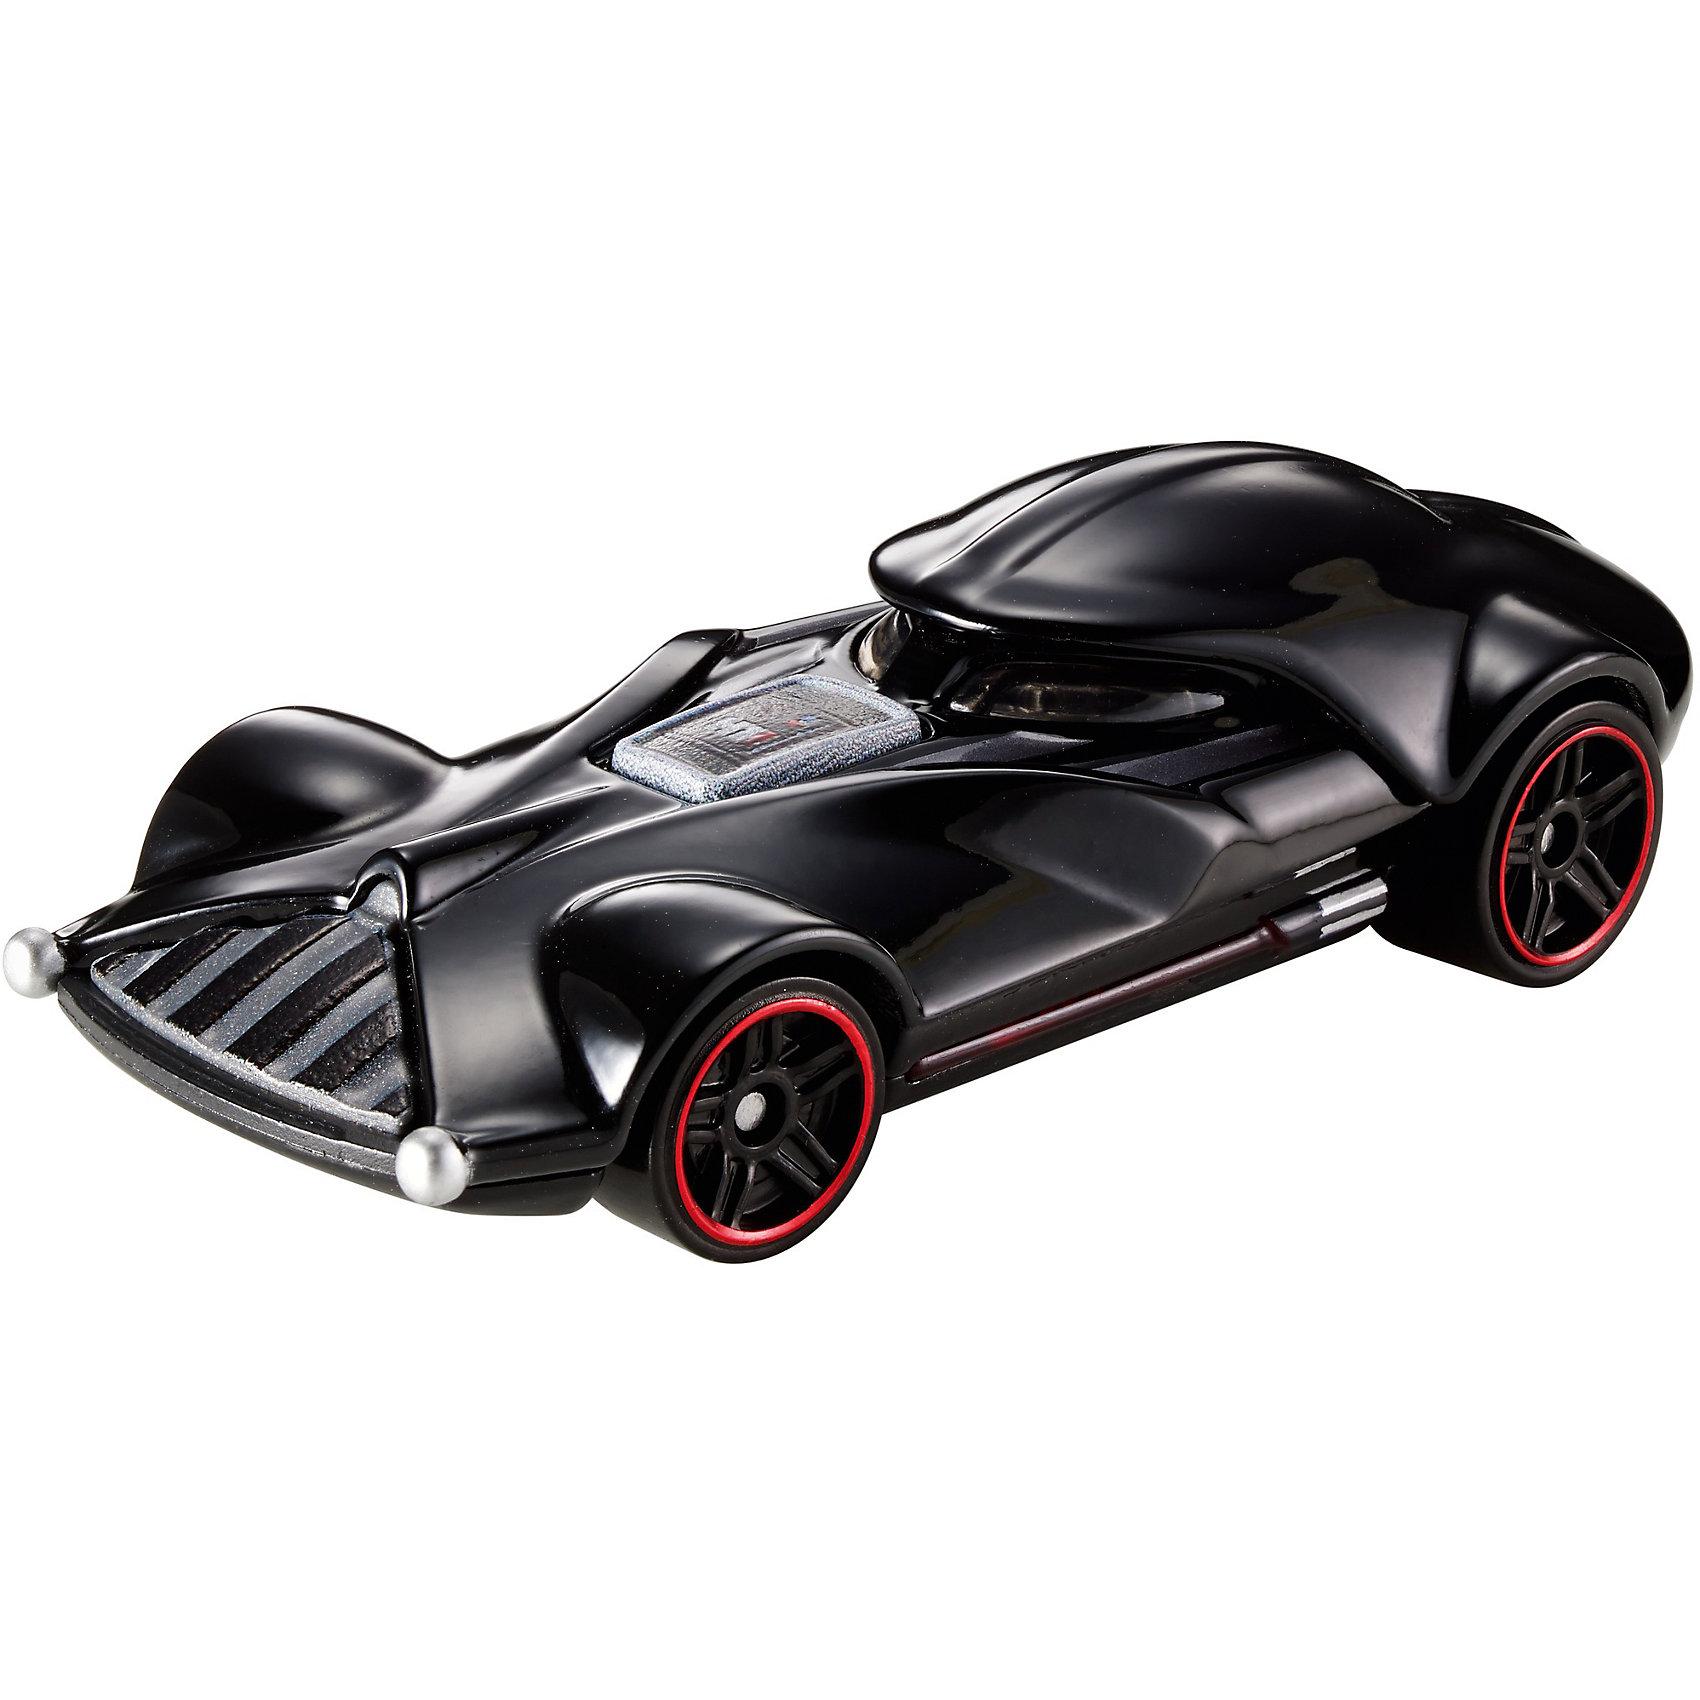 Машинка Darth Vader SW, Hot WheelsМашинки<br><br><br>Ширина мм: 140<br>Глубина мм: 40<br>Высота мм: 165<br>Вес г: 91<br>Возраст от месяцев: 36<br>Возраст до месяцев: 72<br>Пол: Мужской<br>Возраст: Детский<br>SKU: 5440262